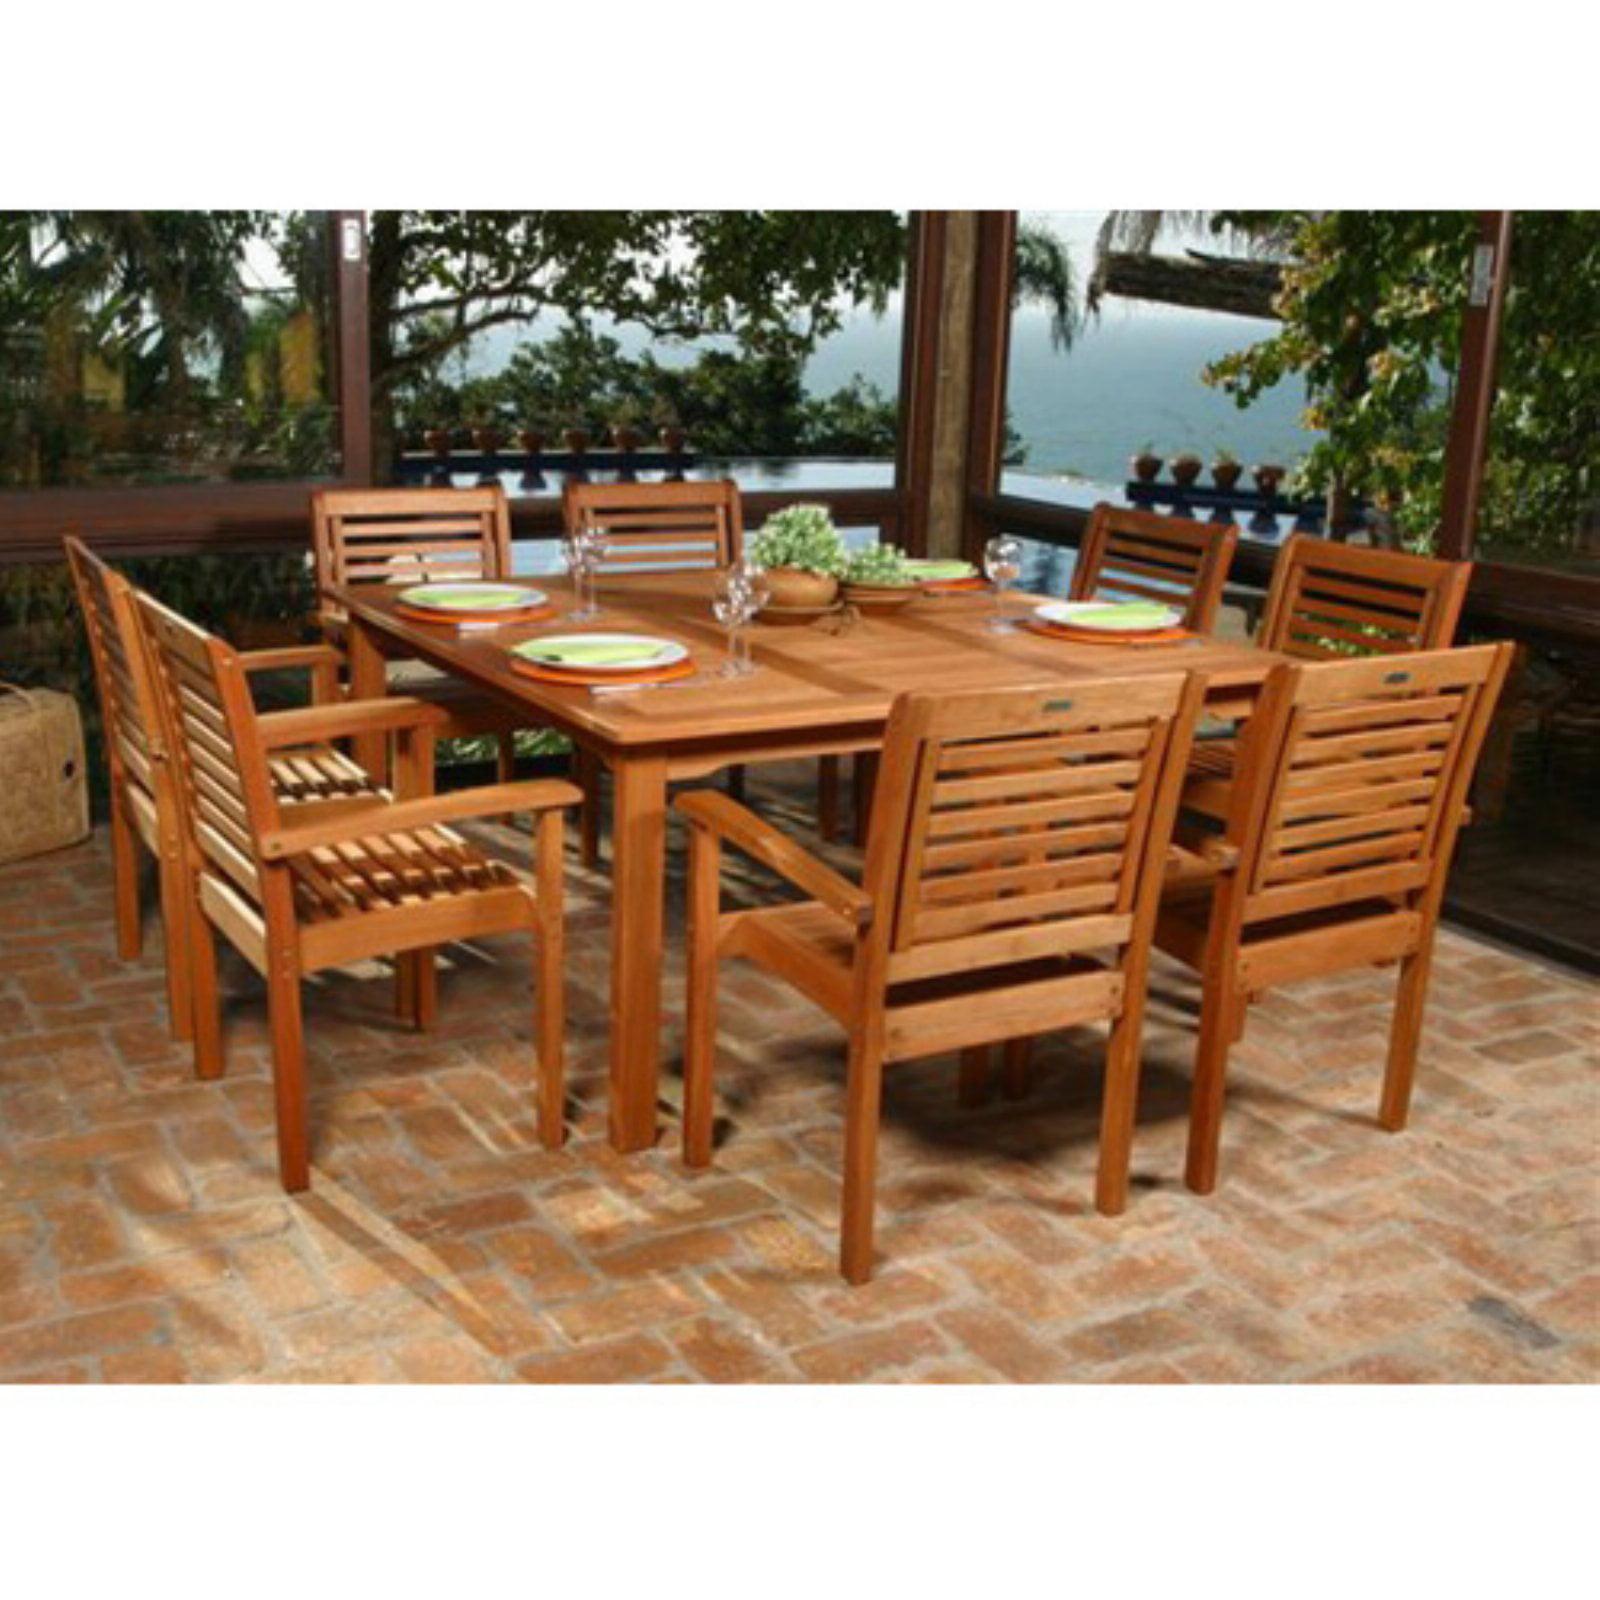 Milano eucalyptus square 9 piece patio dining set brown walmart com